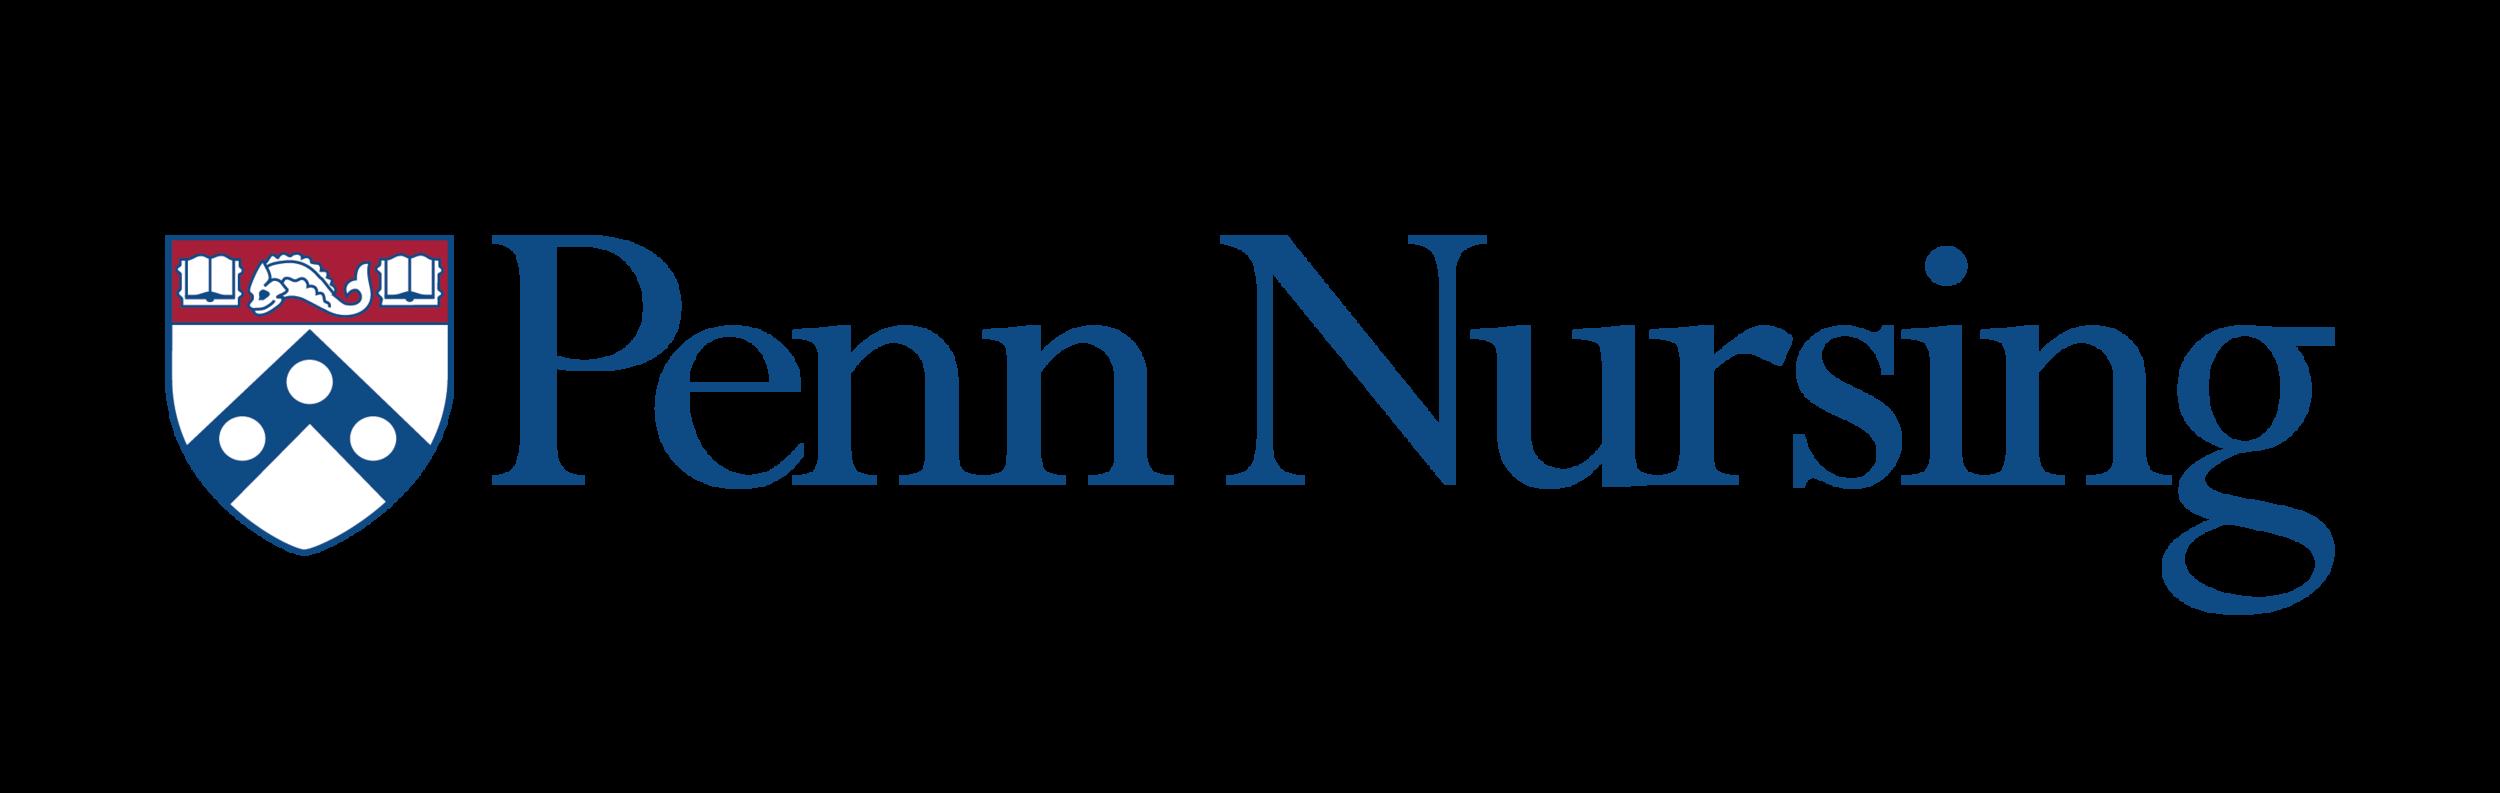 PennNursing_Logo__horizontal one line_full color_2018-01.png